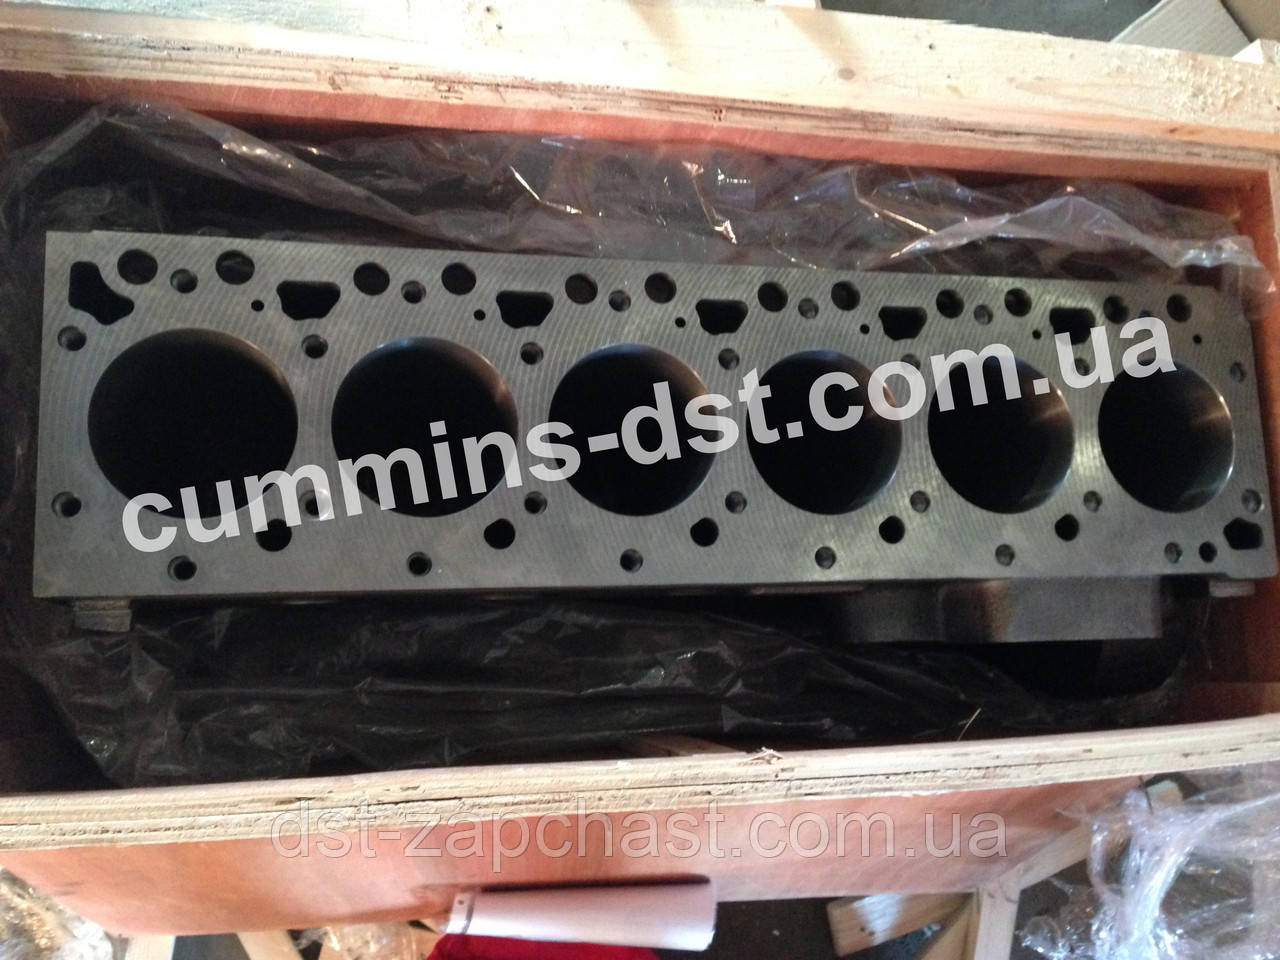 Блок цилиндров для двигателя Cummins 6B5.9 3935943/3935936/3802674/3931822